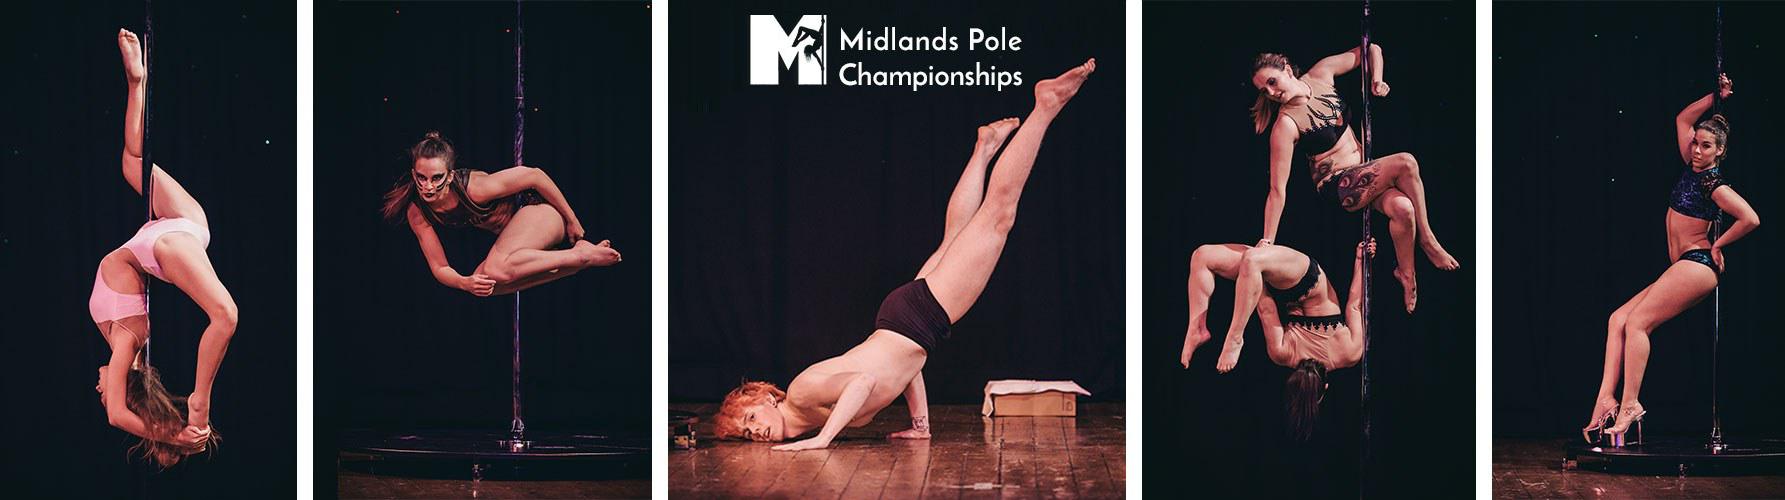 Midlands Pole Championships